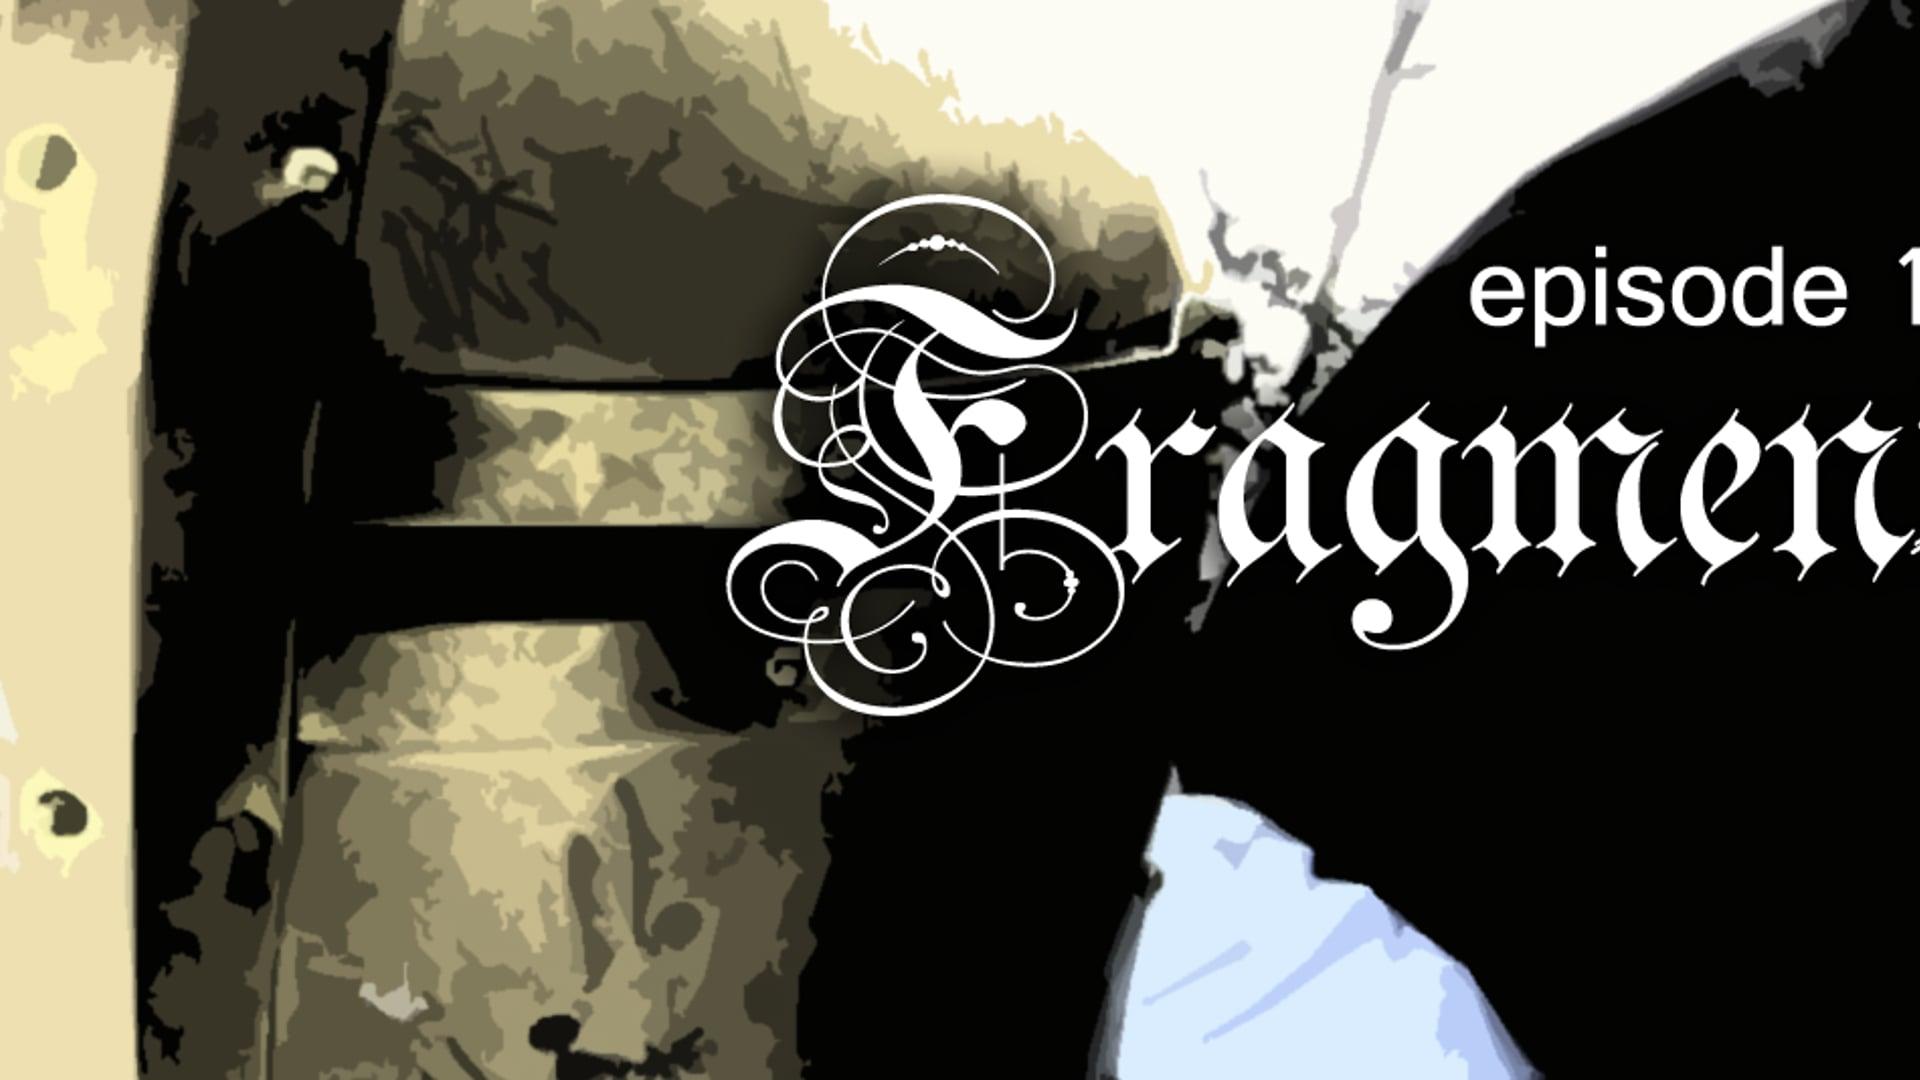 E10: Fragmented